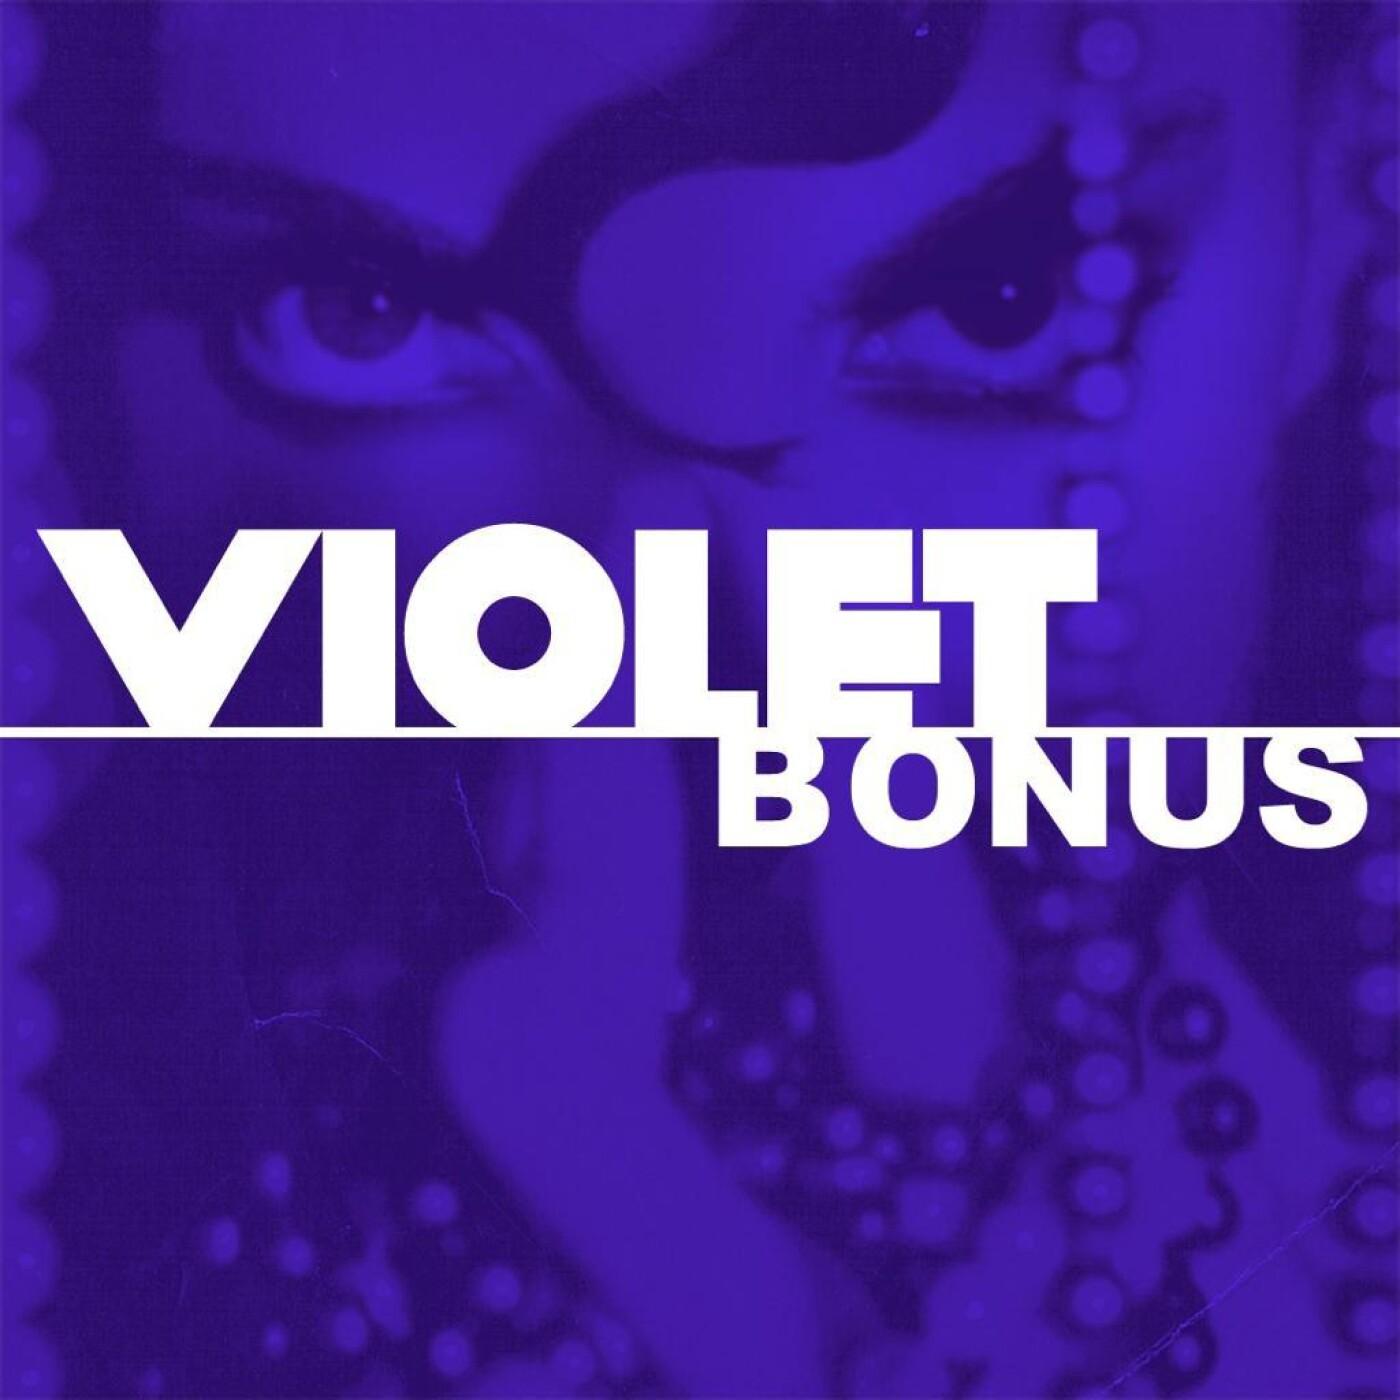 Bonus #1 - Diamonds and pearls